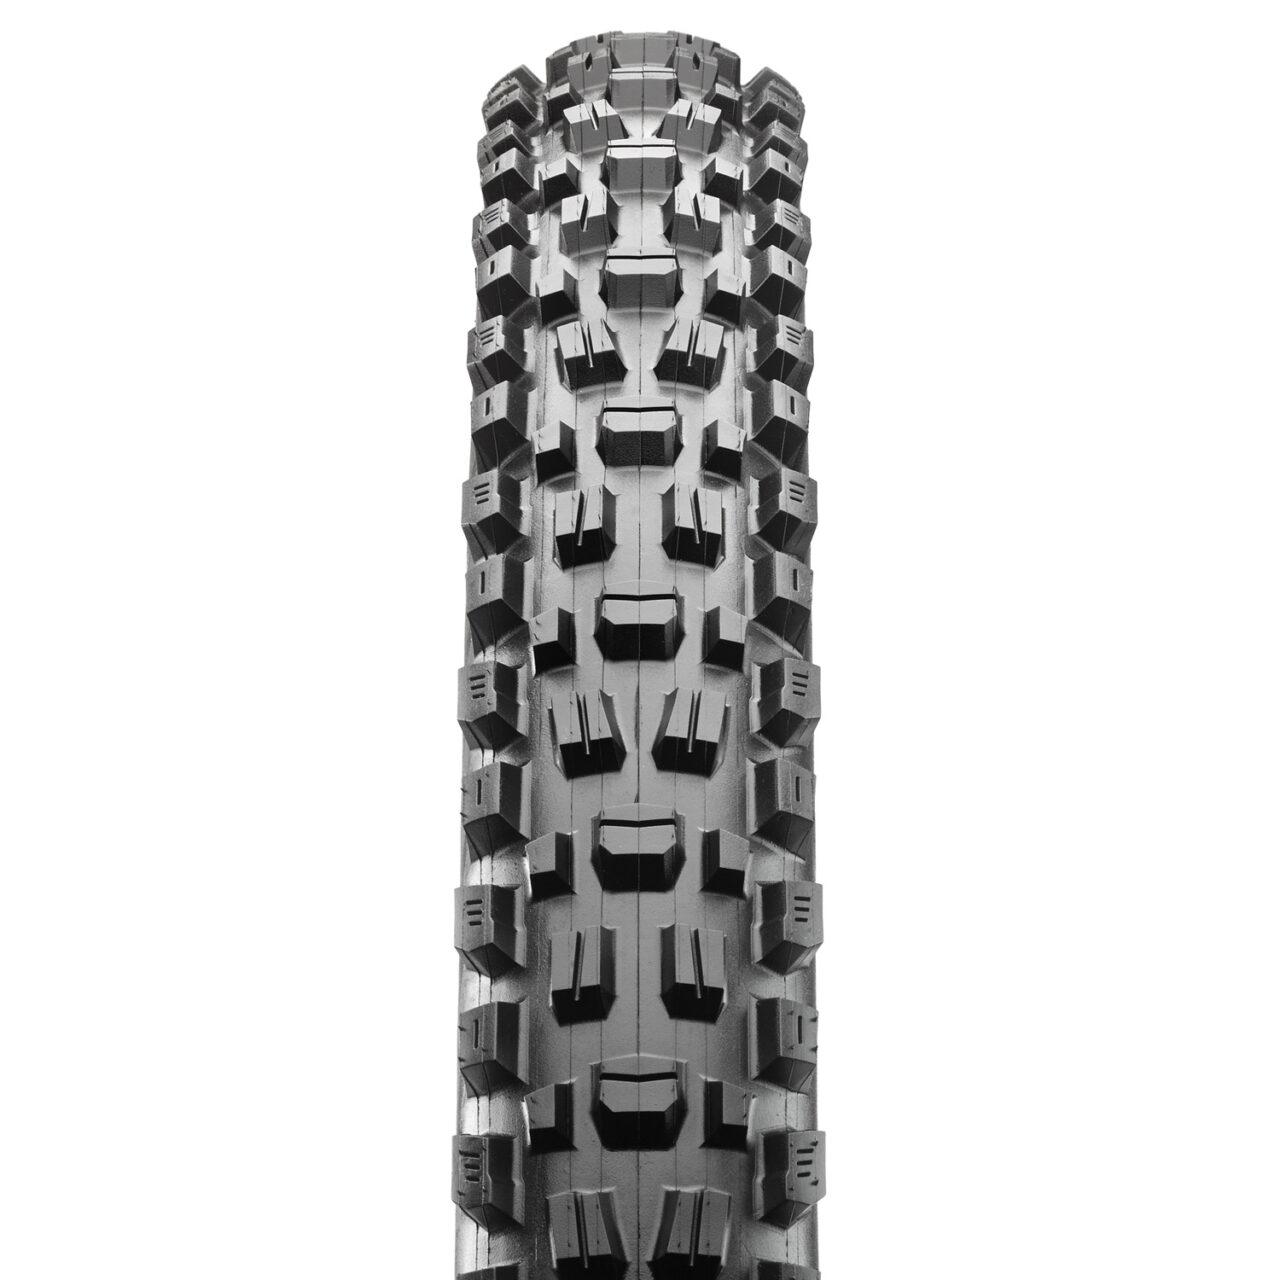 Maxxis Assegai bicycle tire tread